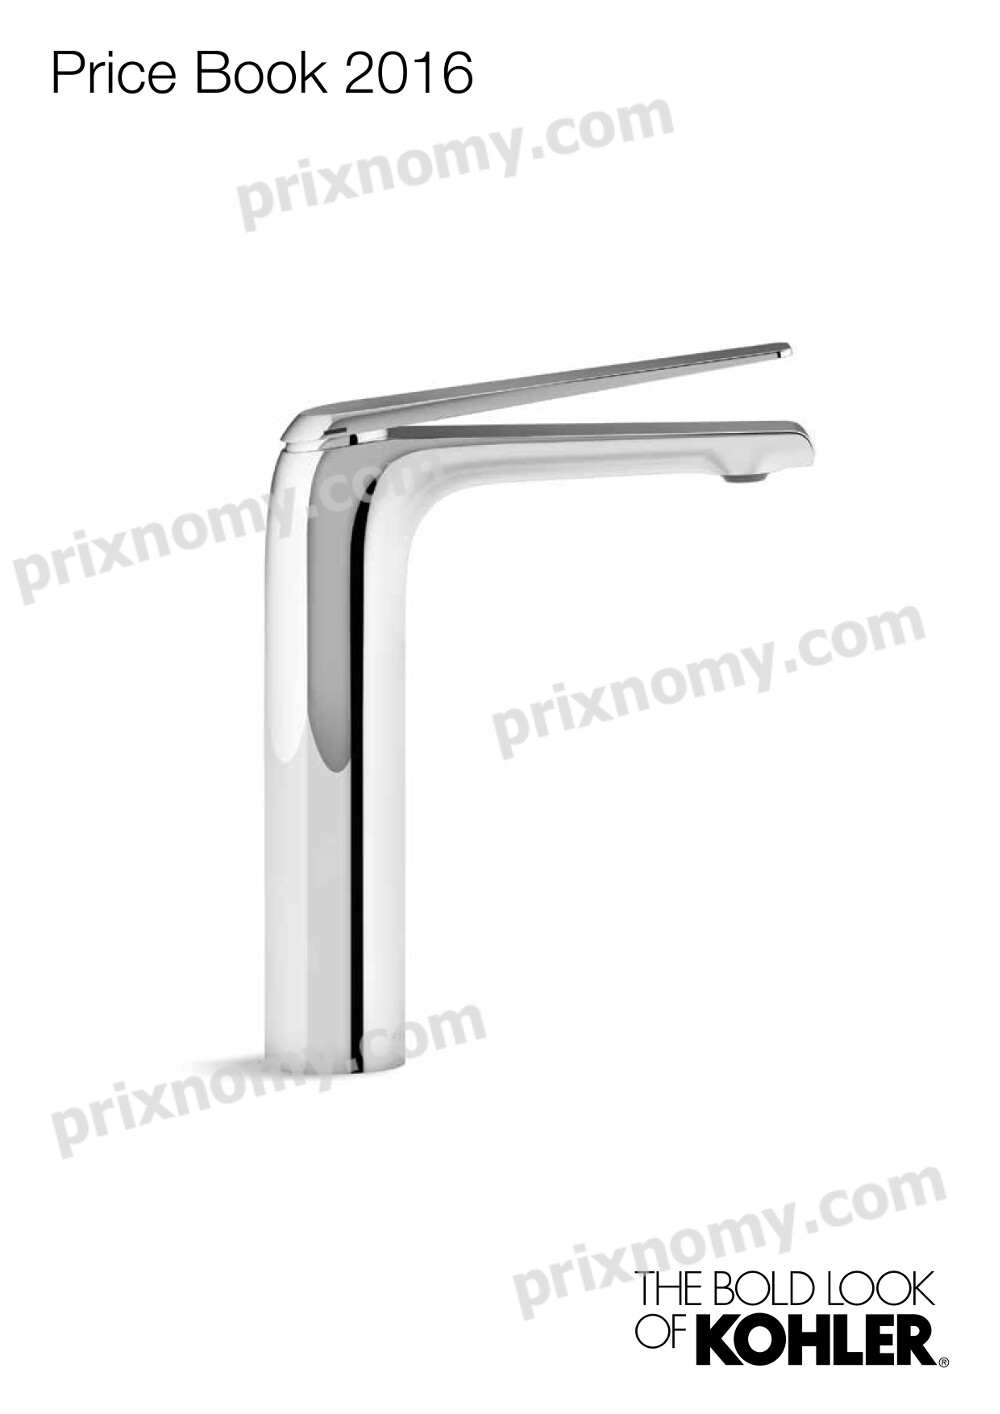 Kohler Bathroom Accessories Price List 2016   Prixnomy